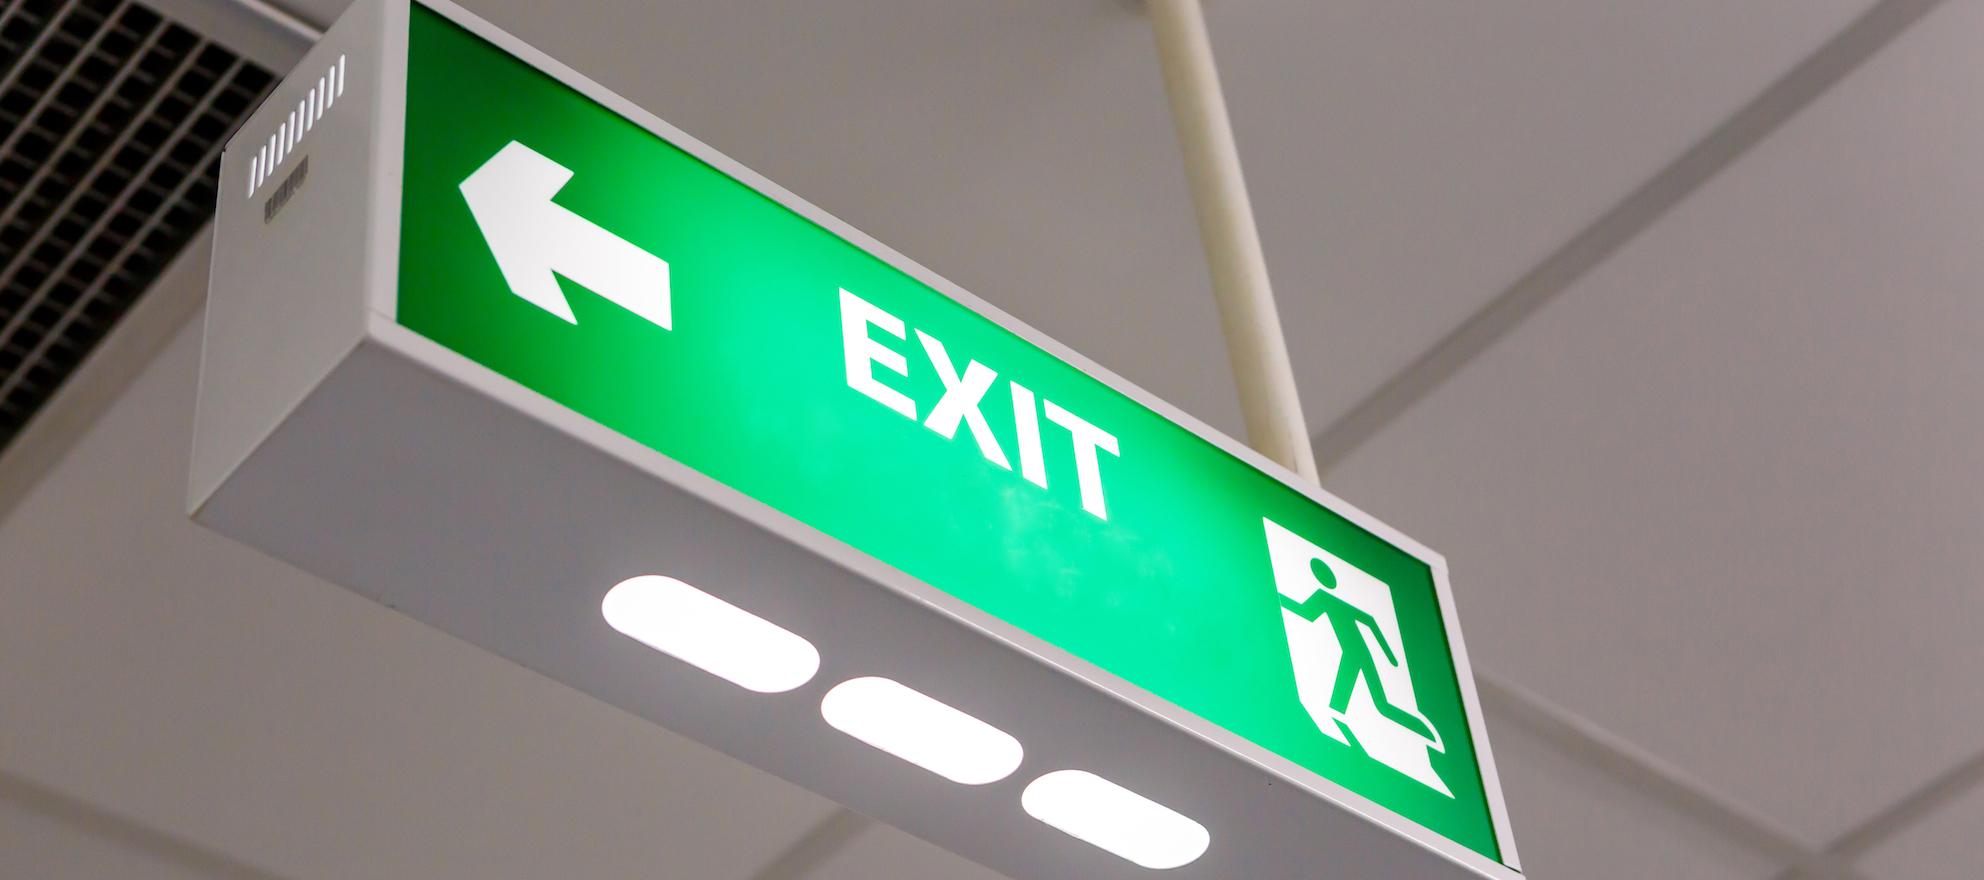 Is Quicken quitting FHA loans?